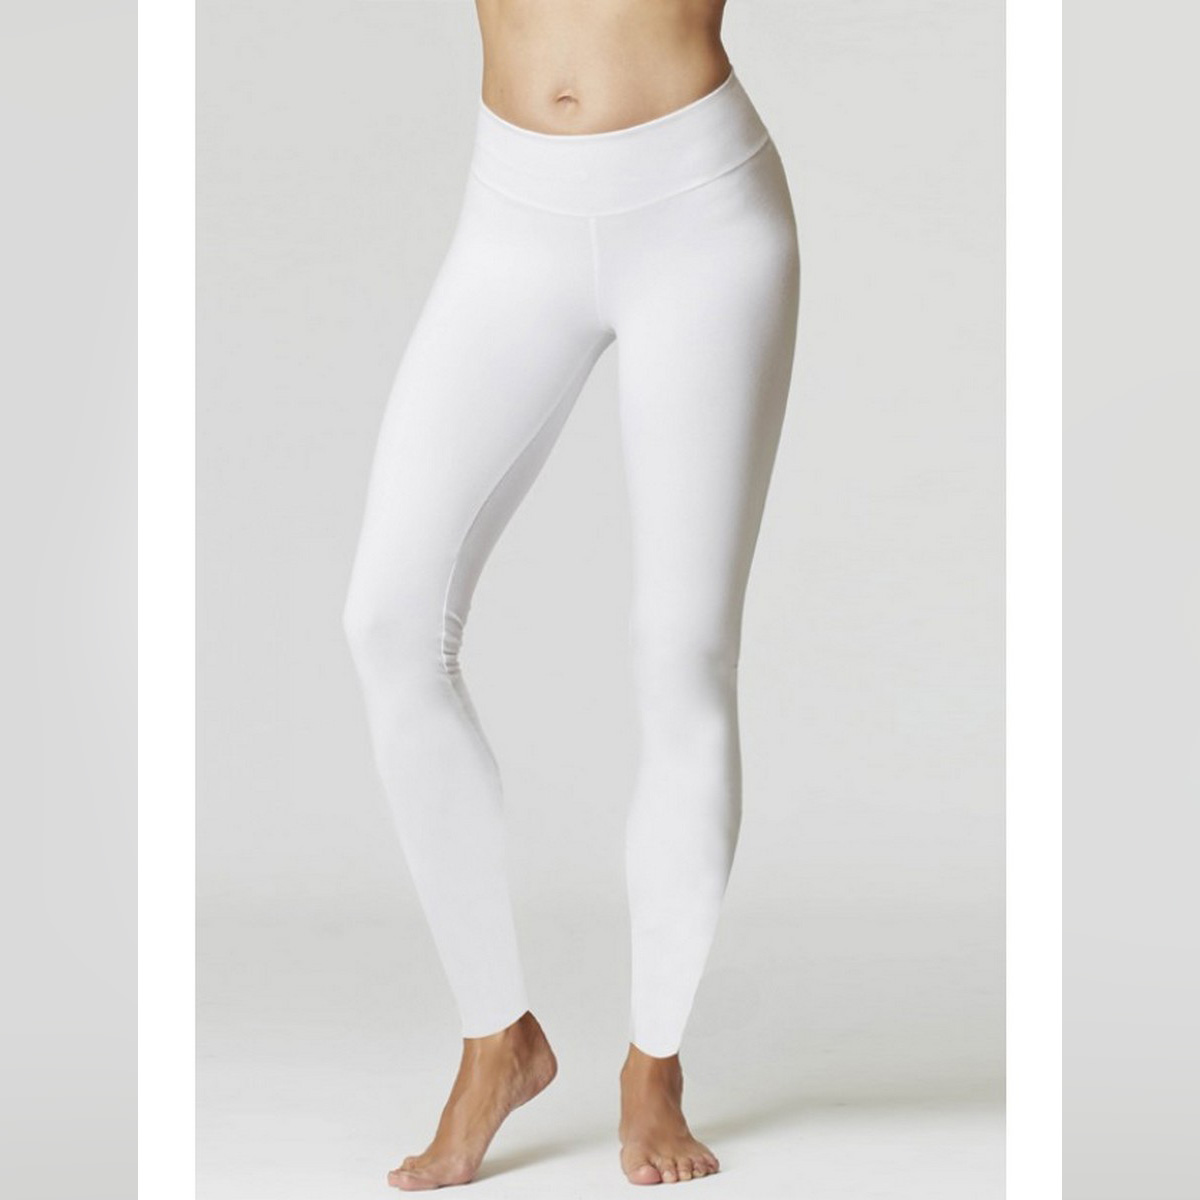 G7 Women's Yoga Leggings High Waist Yoga Pants Workout Leggings Tummy Control 4 Way Stretch Gym Leggings